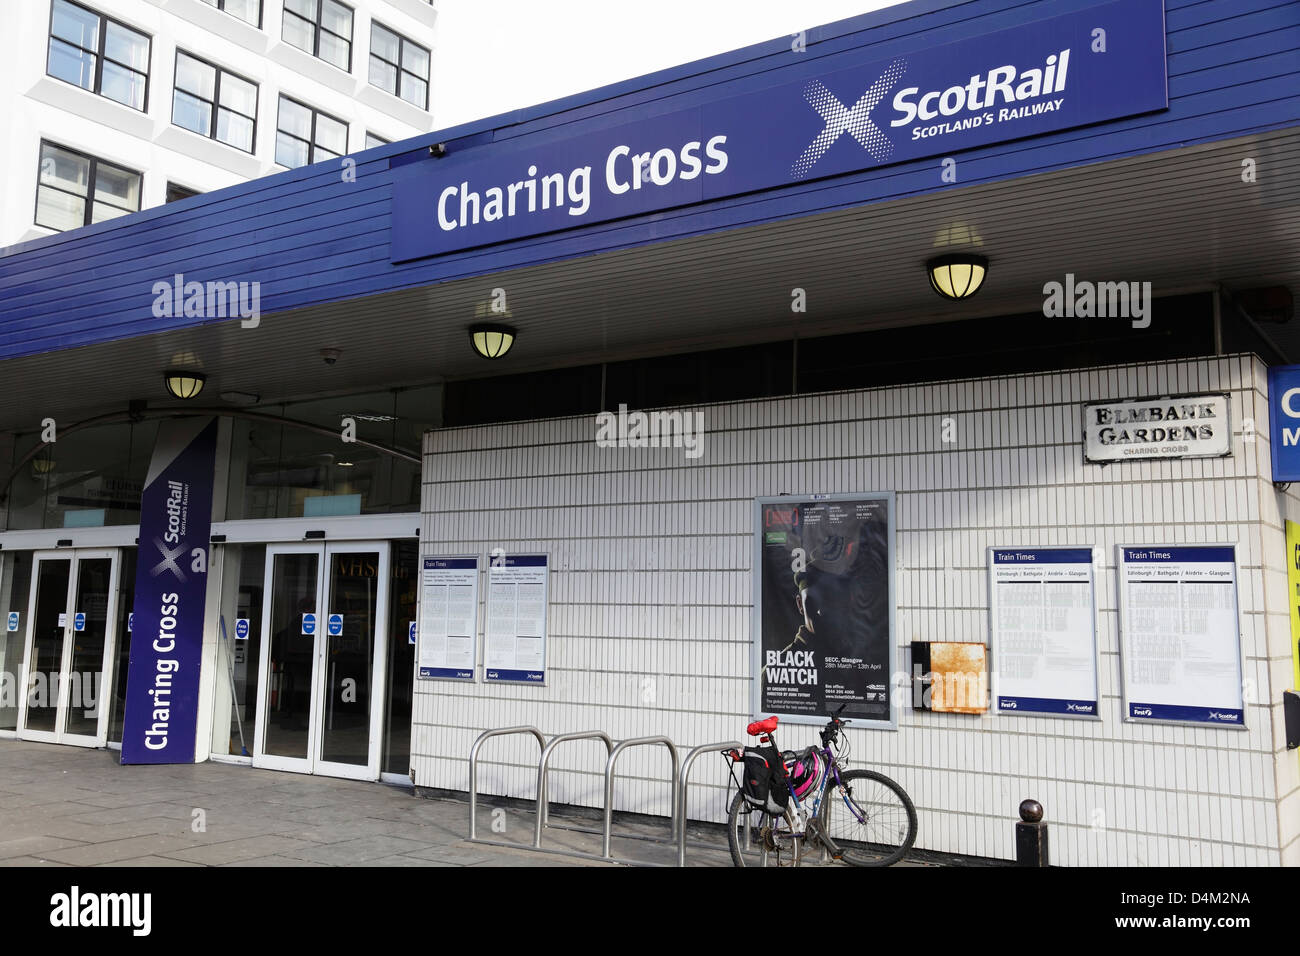 Entrance to Charing Cross Scotrail Train Station on Elmbank Gardens in Glasgow, Scotland, UK - Stock Image